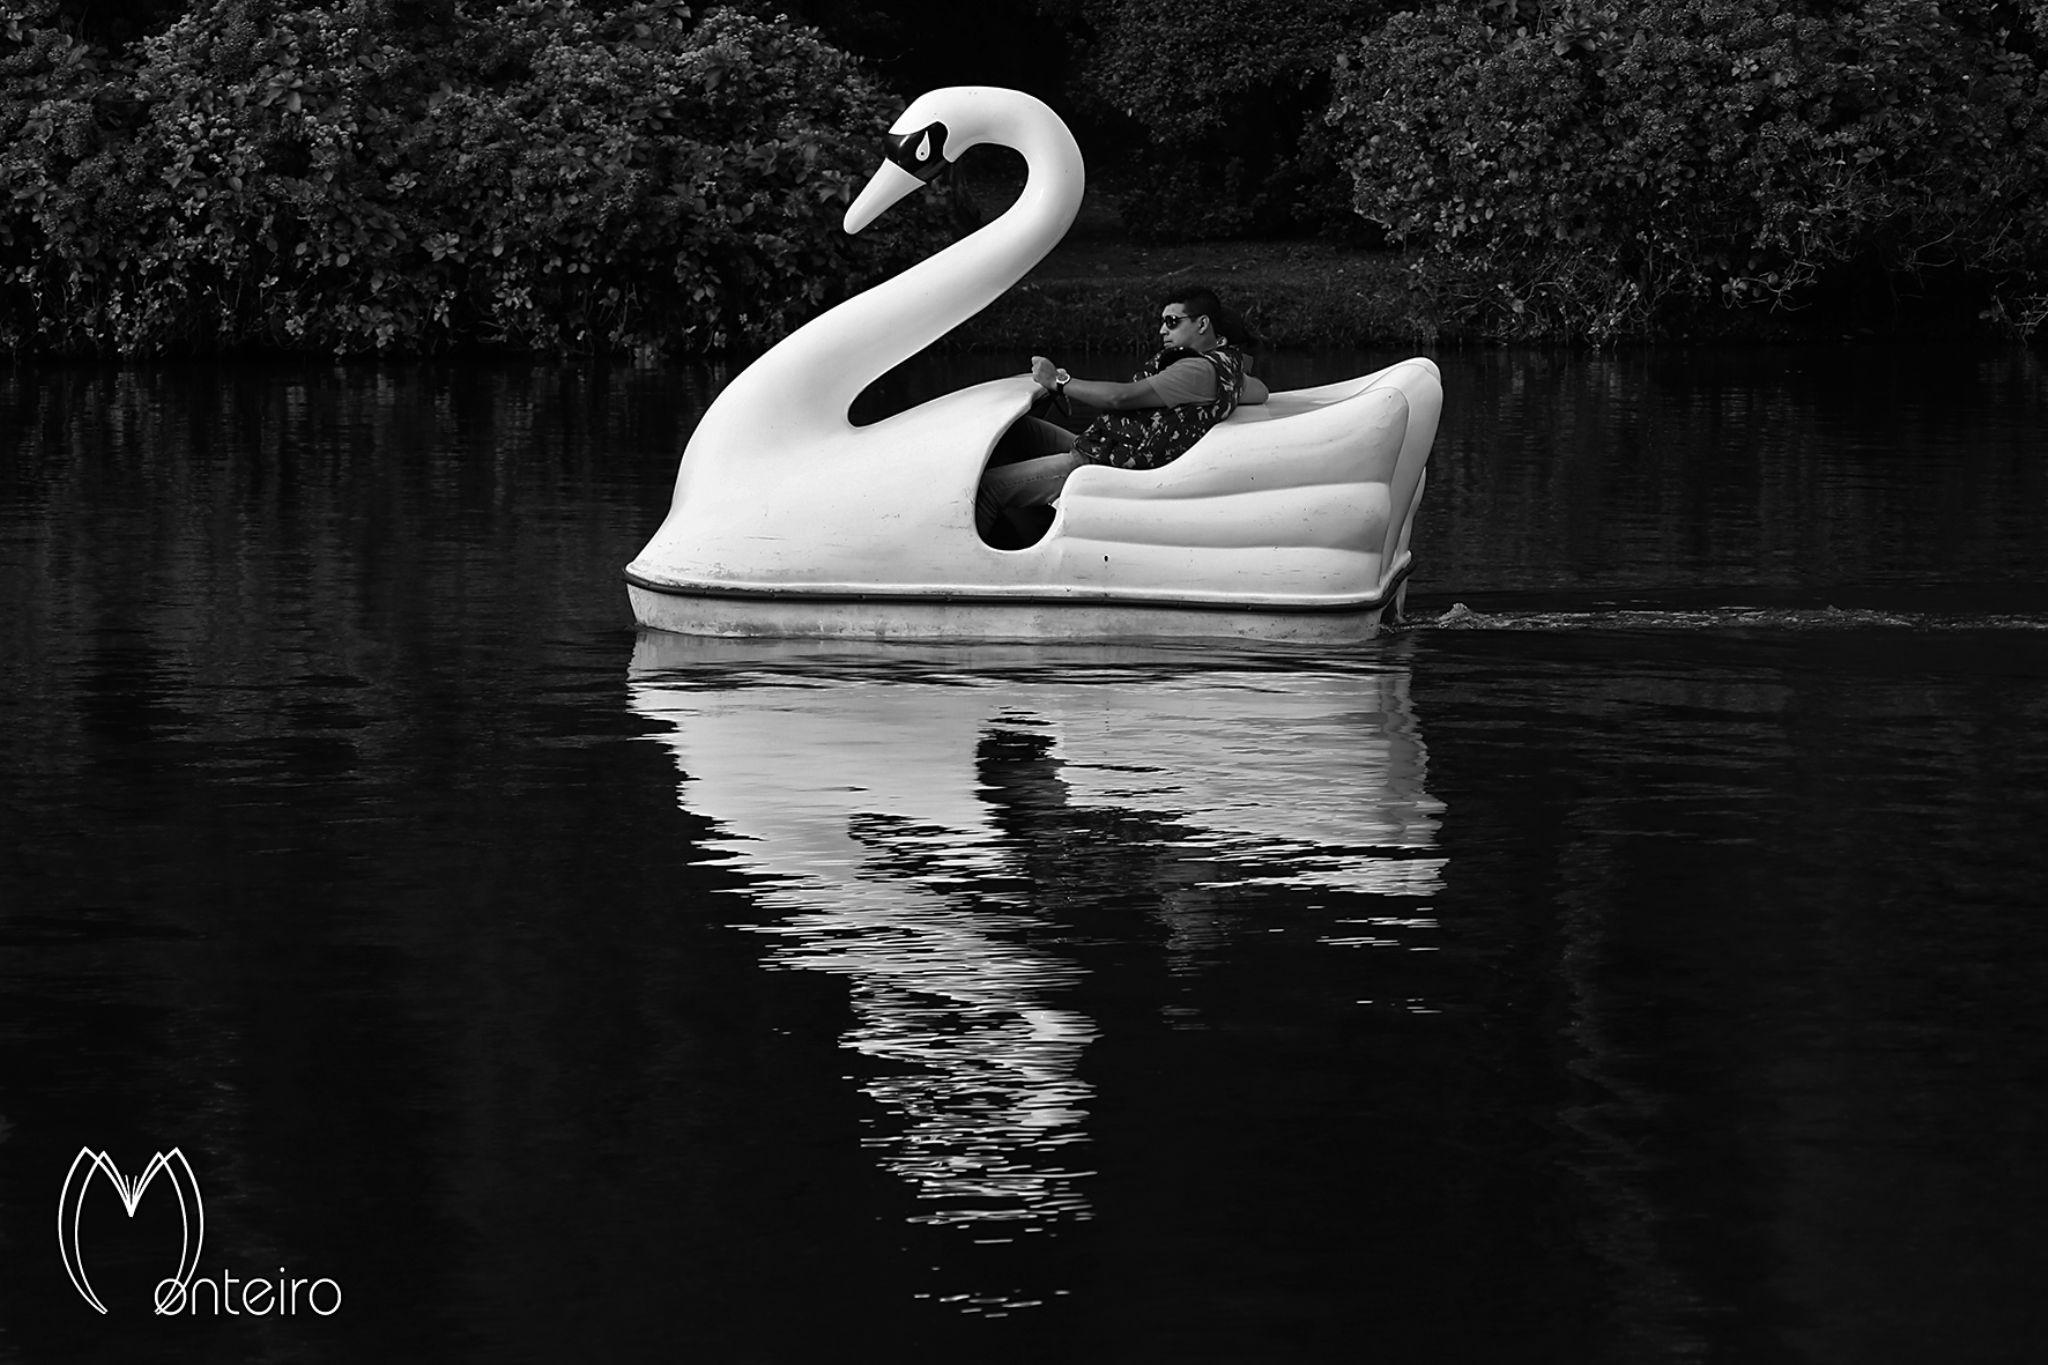 Swan by Sergio Monteiro